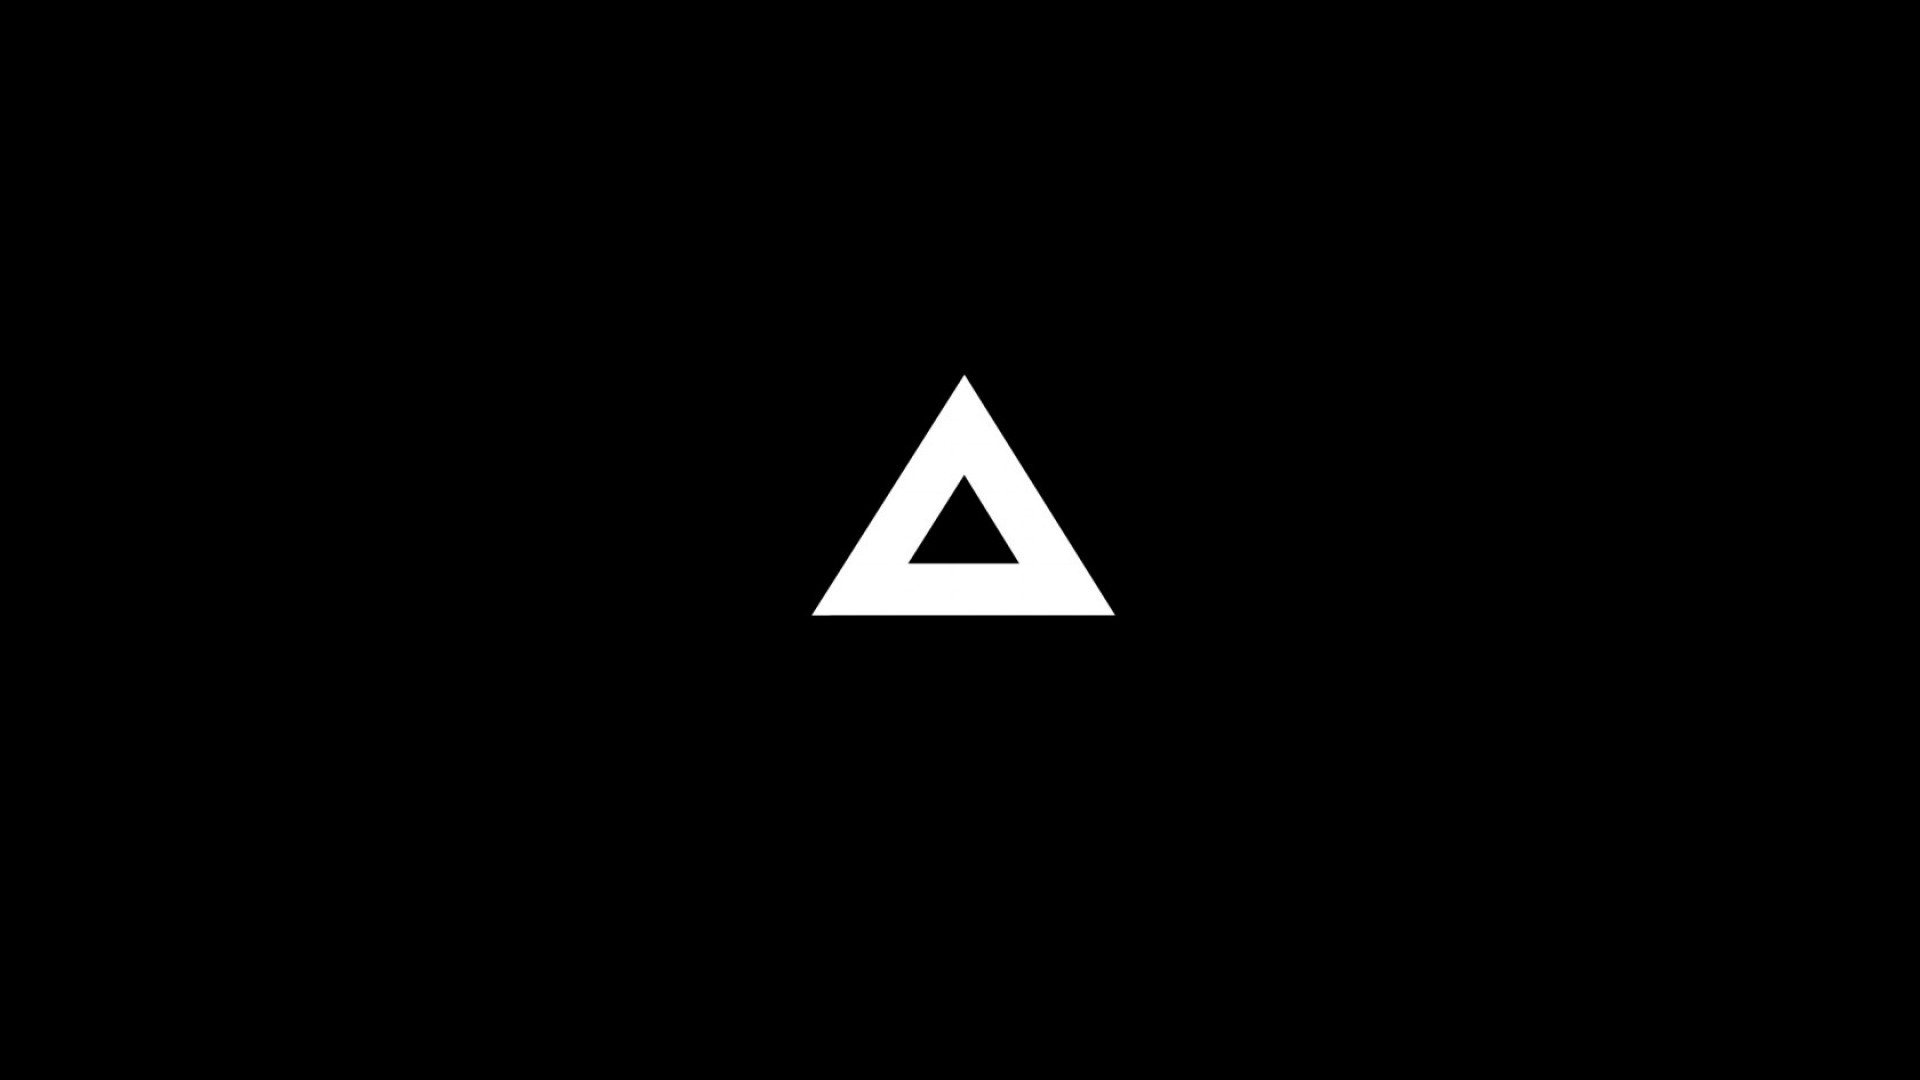 Preview wallpaper triangle, minimalism, black, white 1920×1080